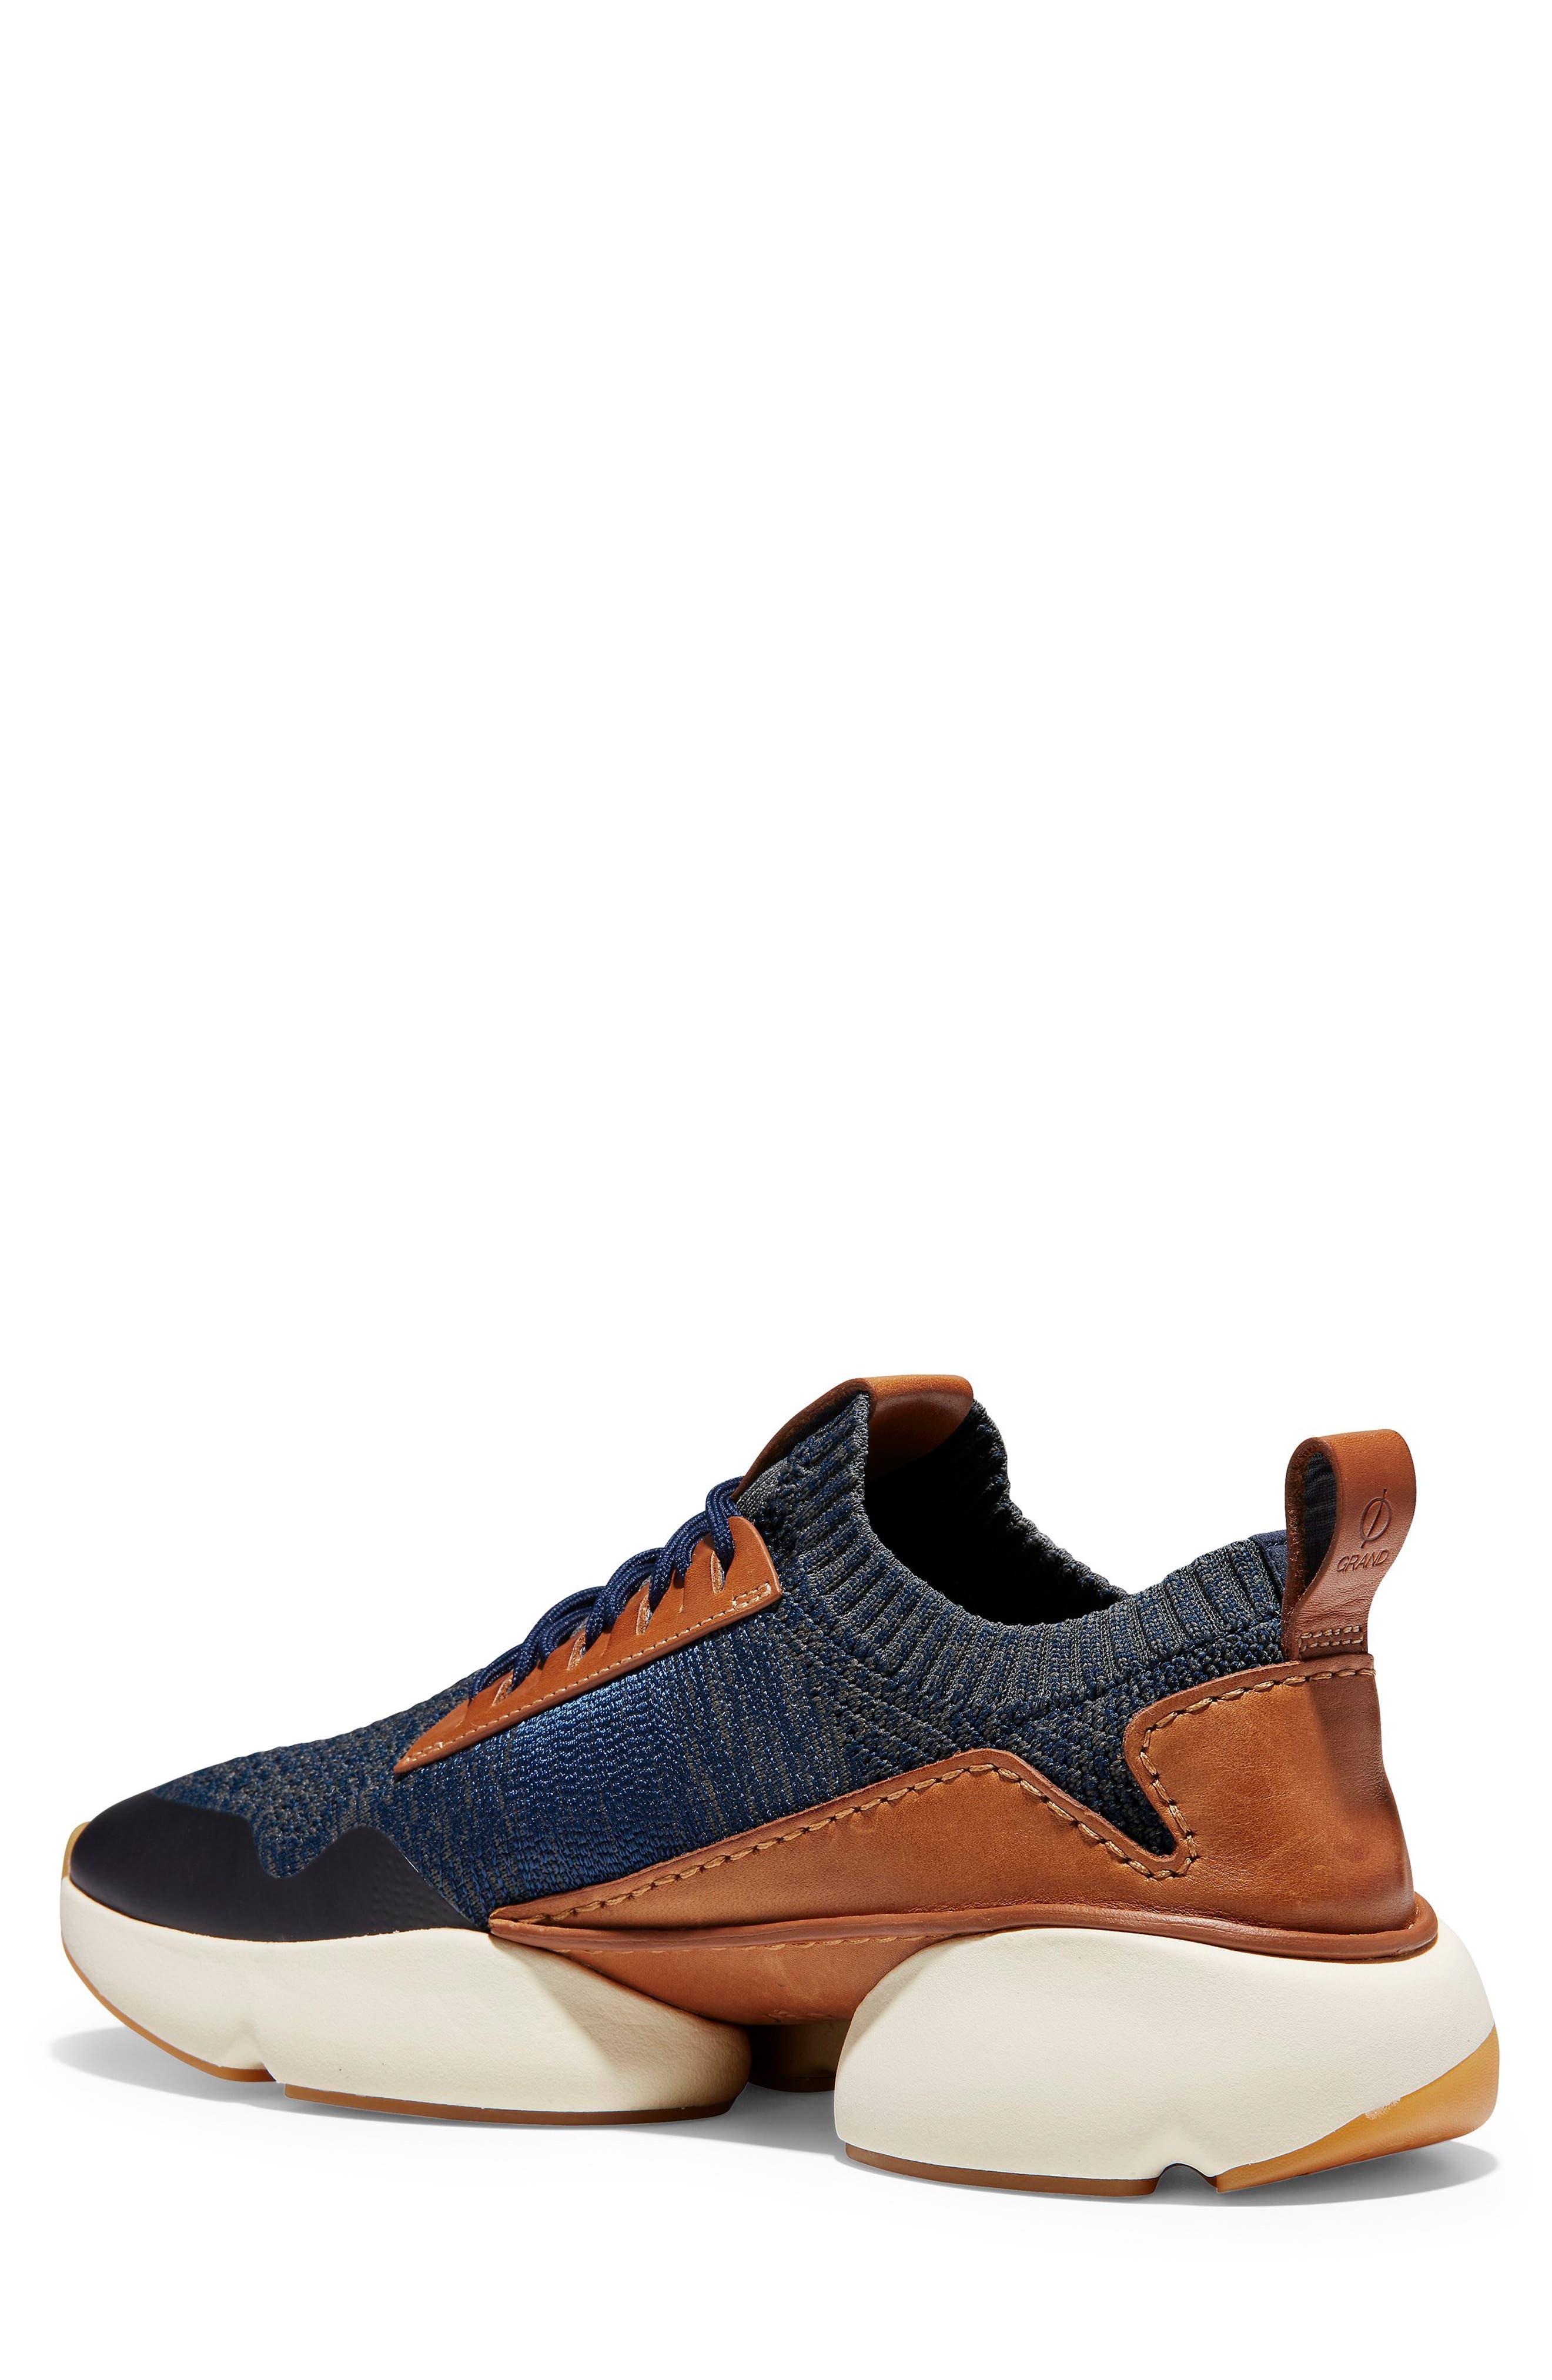 ZeroGrand All-Day Trainer Sneaker,                             Alternate thumbnail 2, color,                             MARINE BLUE/ TAN KNIT